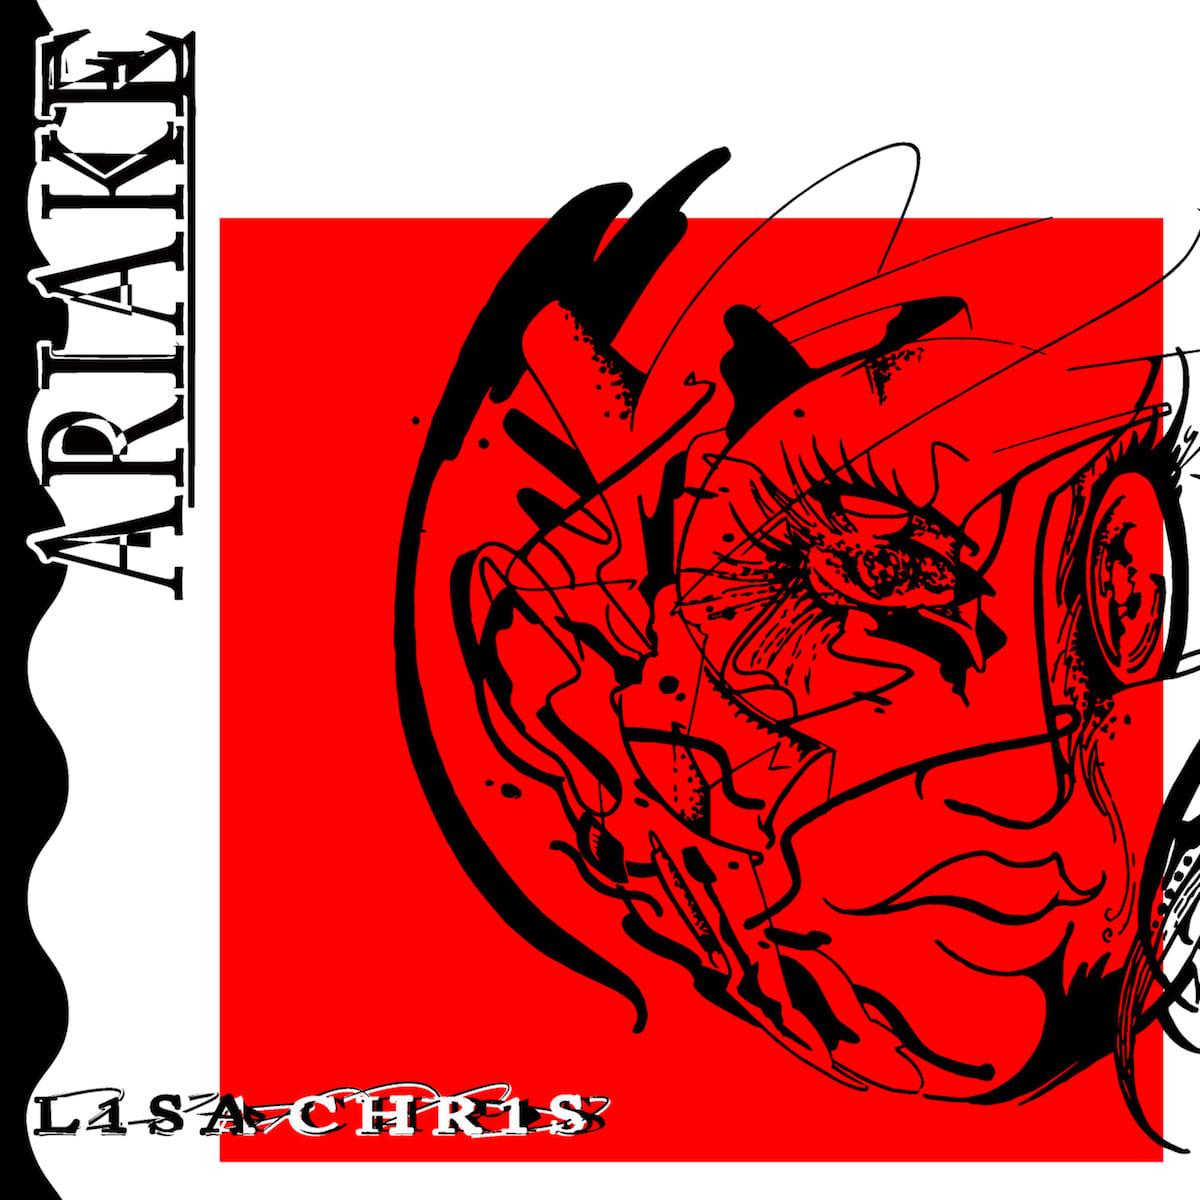 LISACHRISが初の作品集『ARIAKE』をリリース&Takuto Shimpoが監督のMVも公開! music180420_lisachris-1200x1200